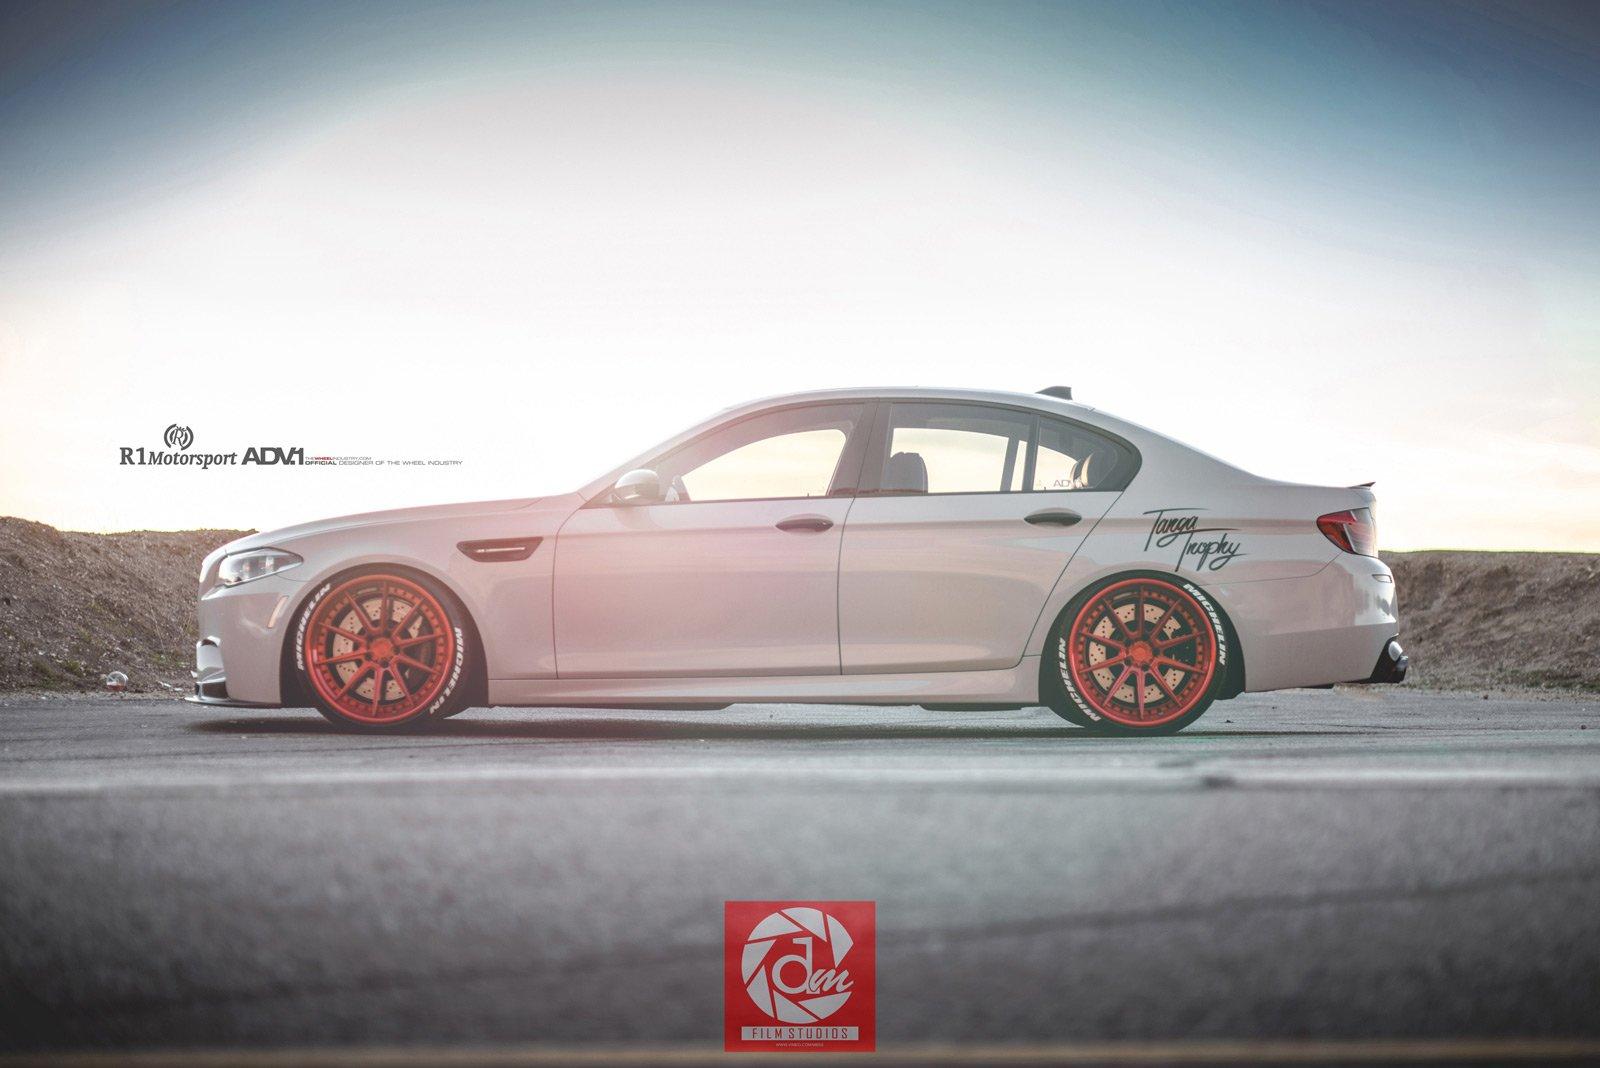 2015 adv1 wheels bmw m5 f10 cars coupe tuning wallpaper 1600x1068 1600x1068